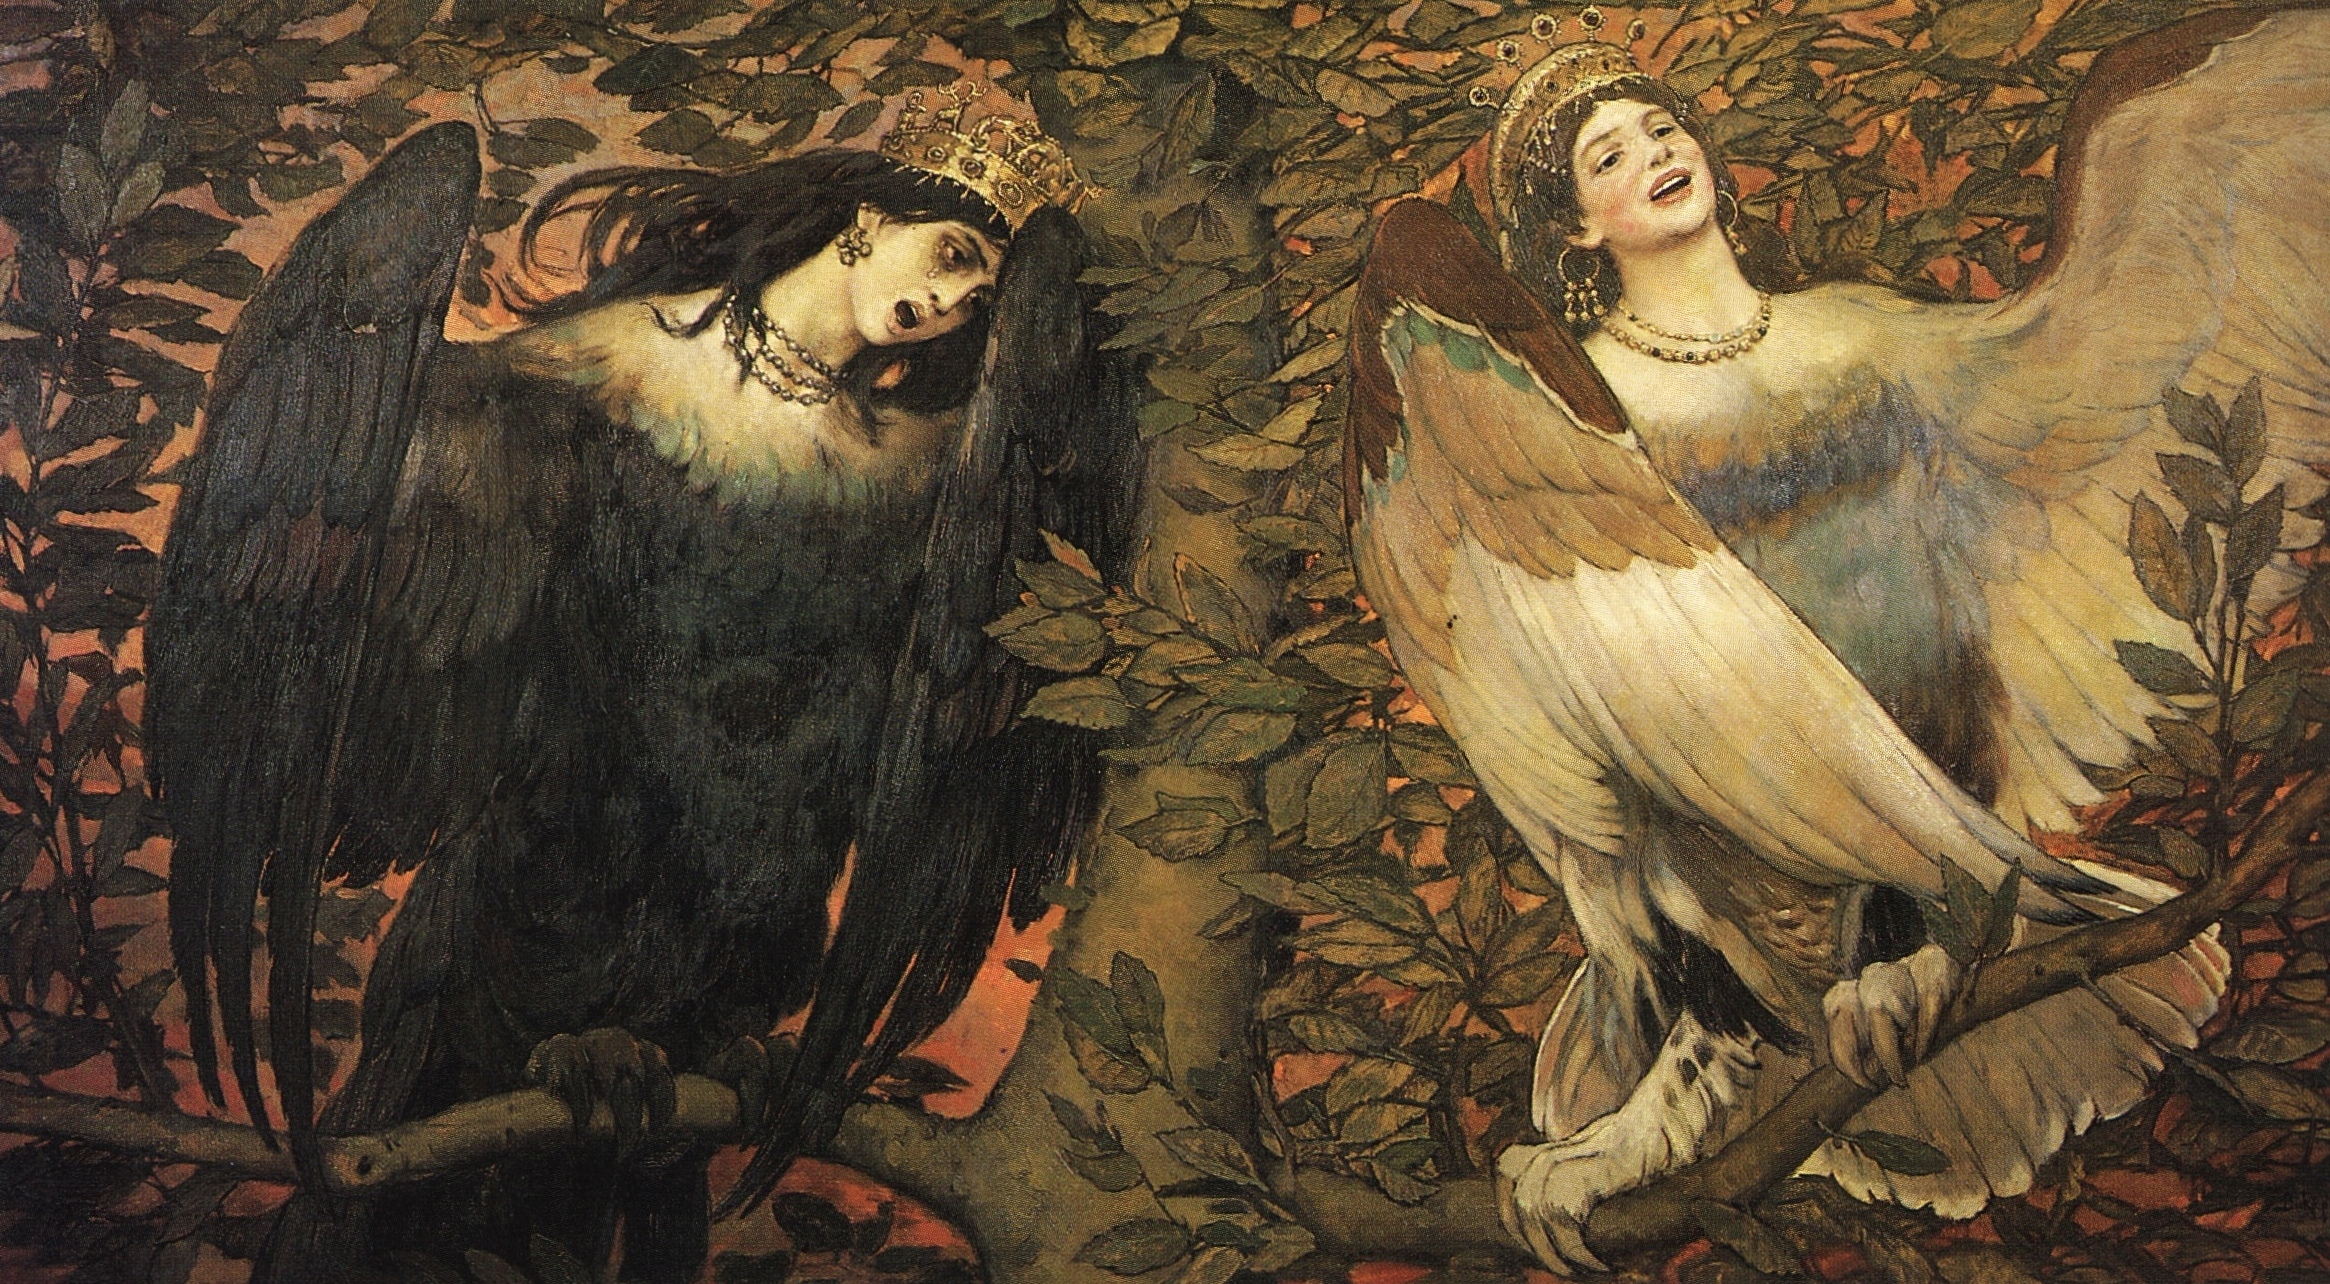 Sirin and Alkonost The Birds of Joy and Sorrow, 1896 - Viktor Vasnetsov